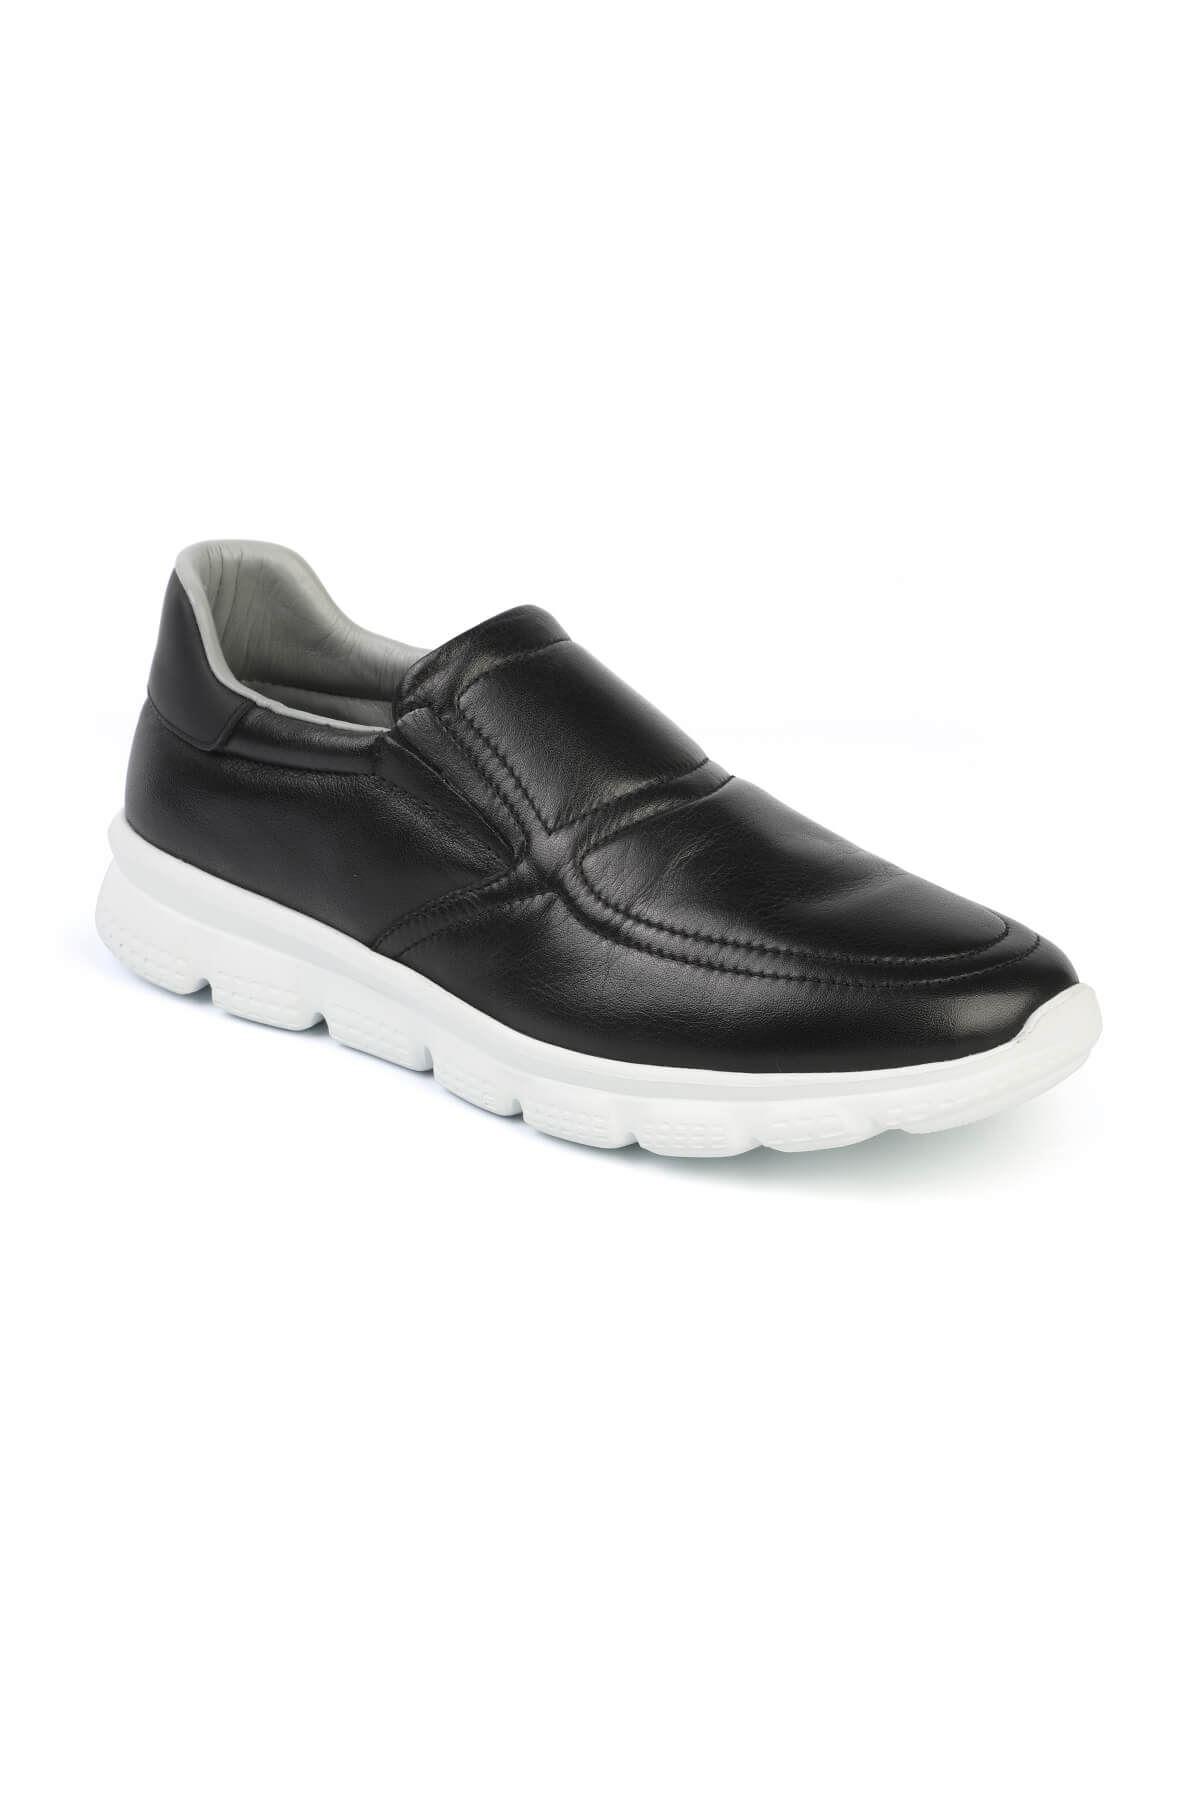 Libero 3122 Black Sports Shoes